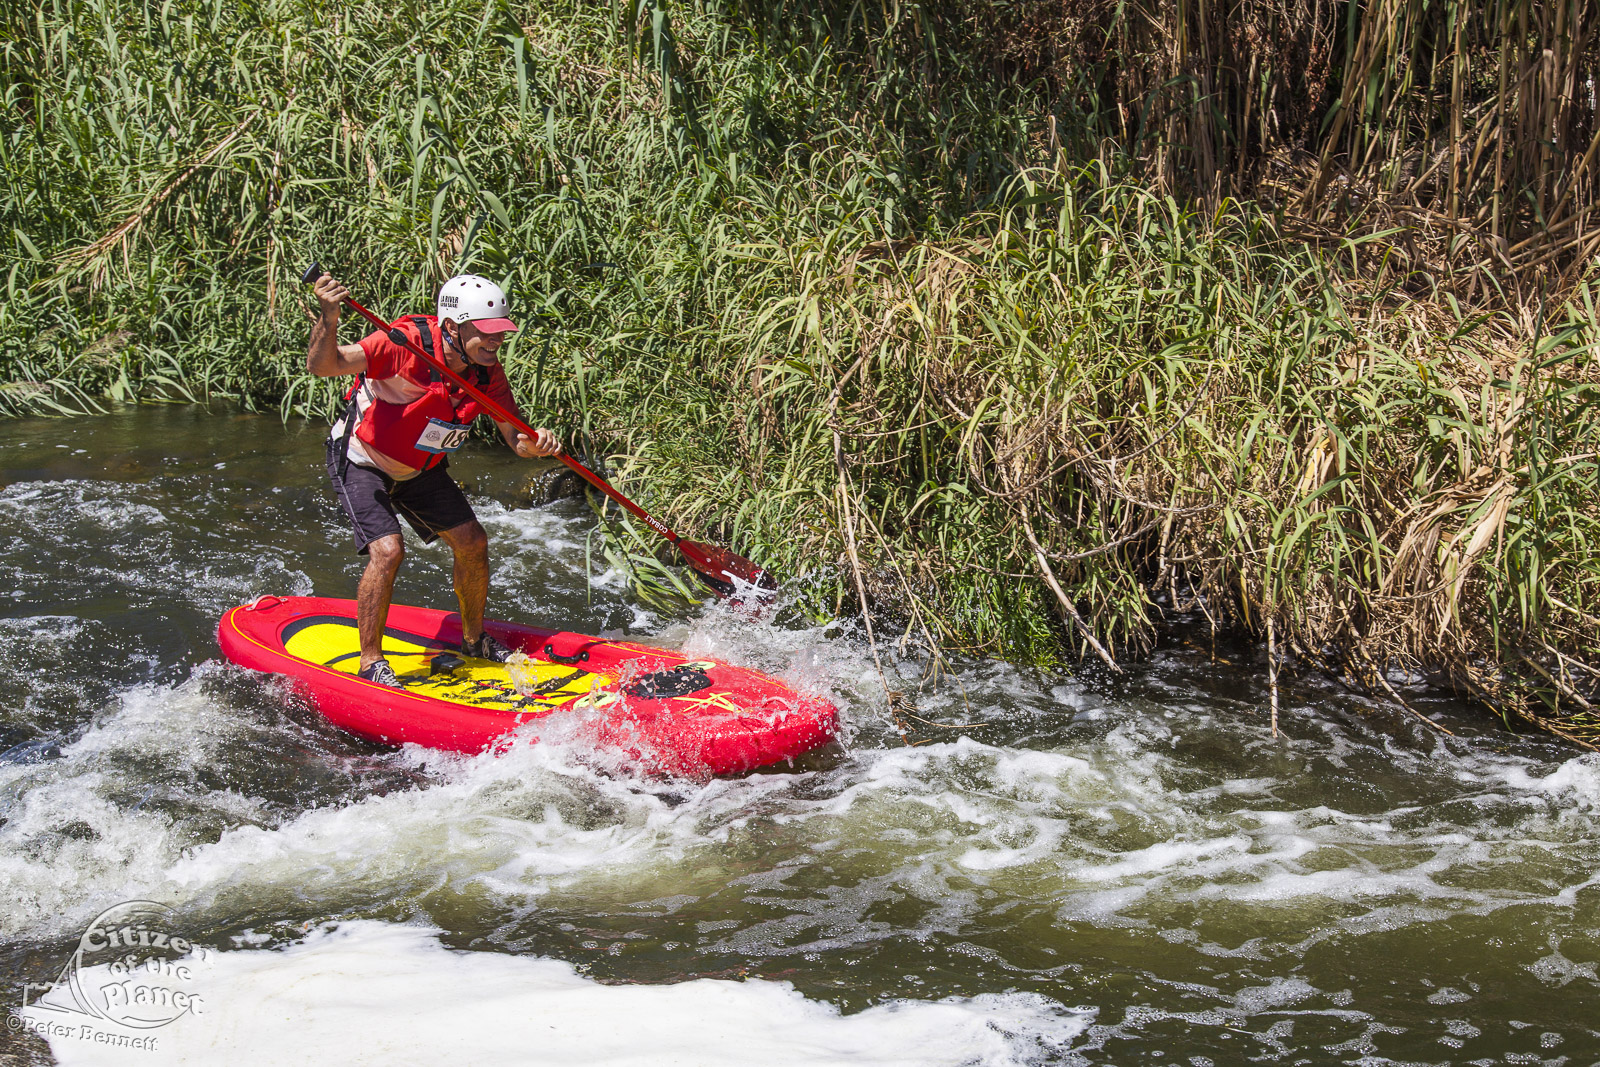 US_CA_48_3871_la_river_boat_race.jpg